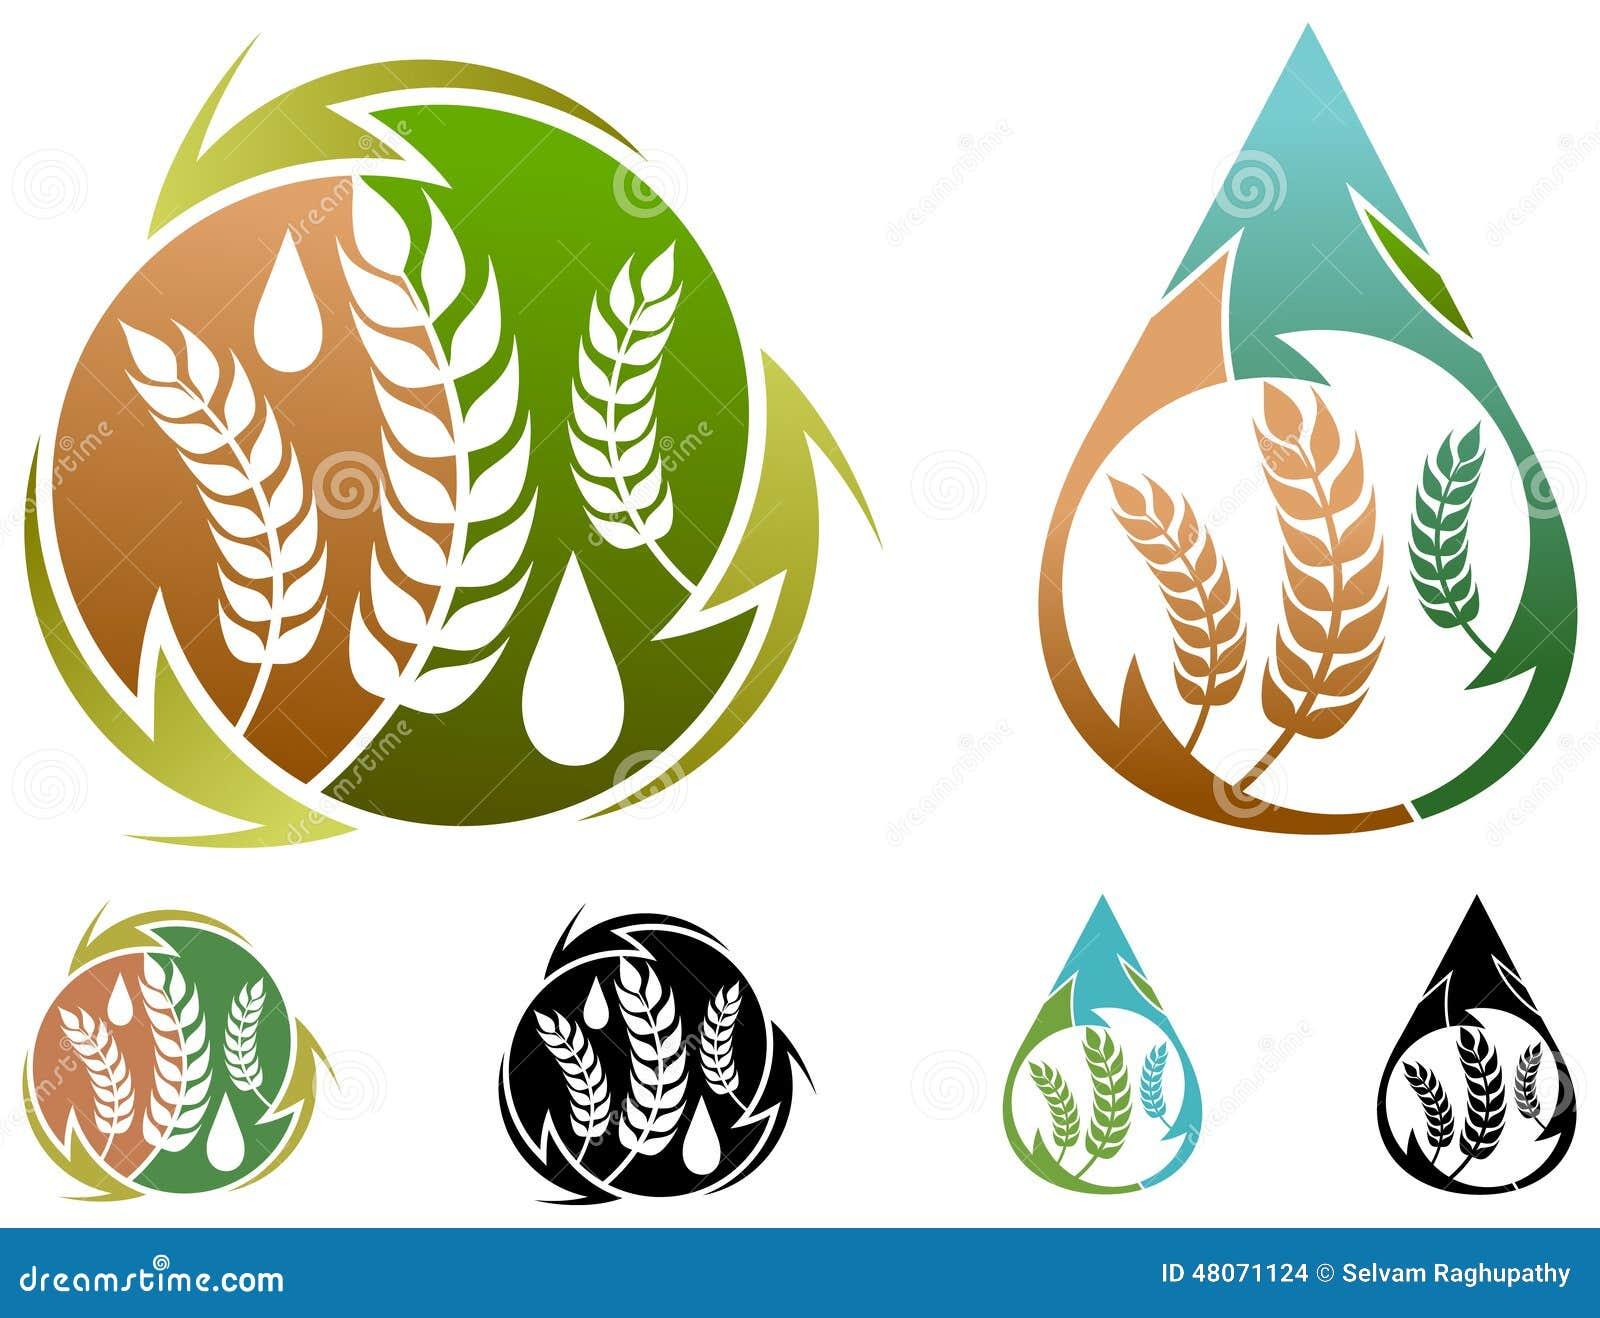 Food industry Logo Design Examples Make online